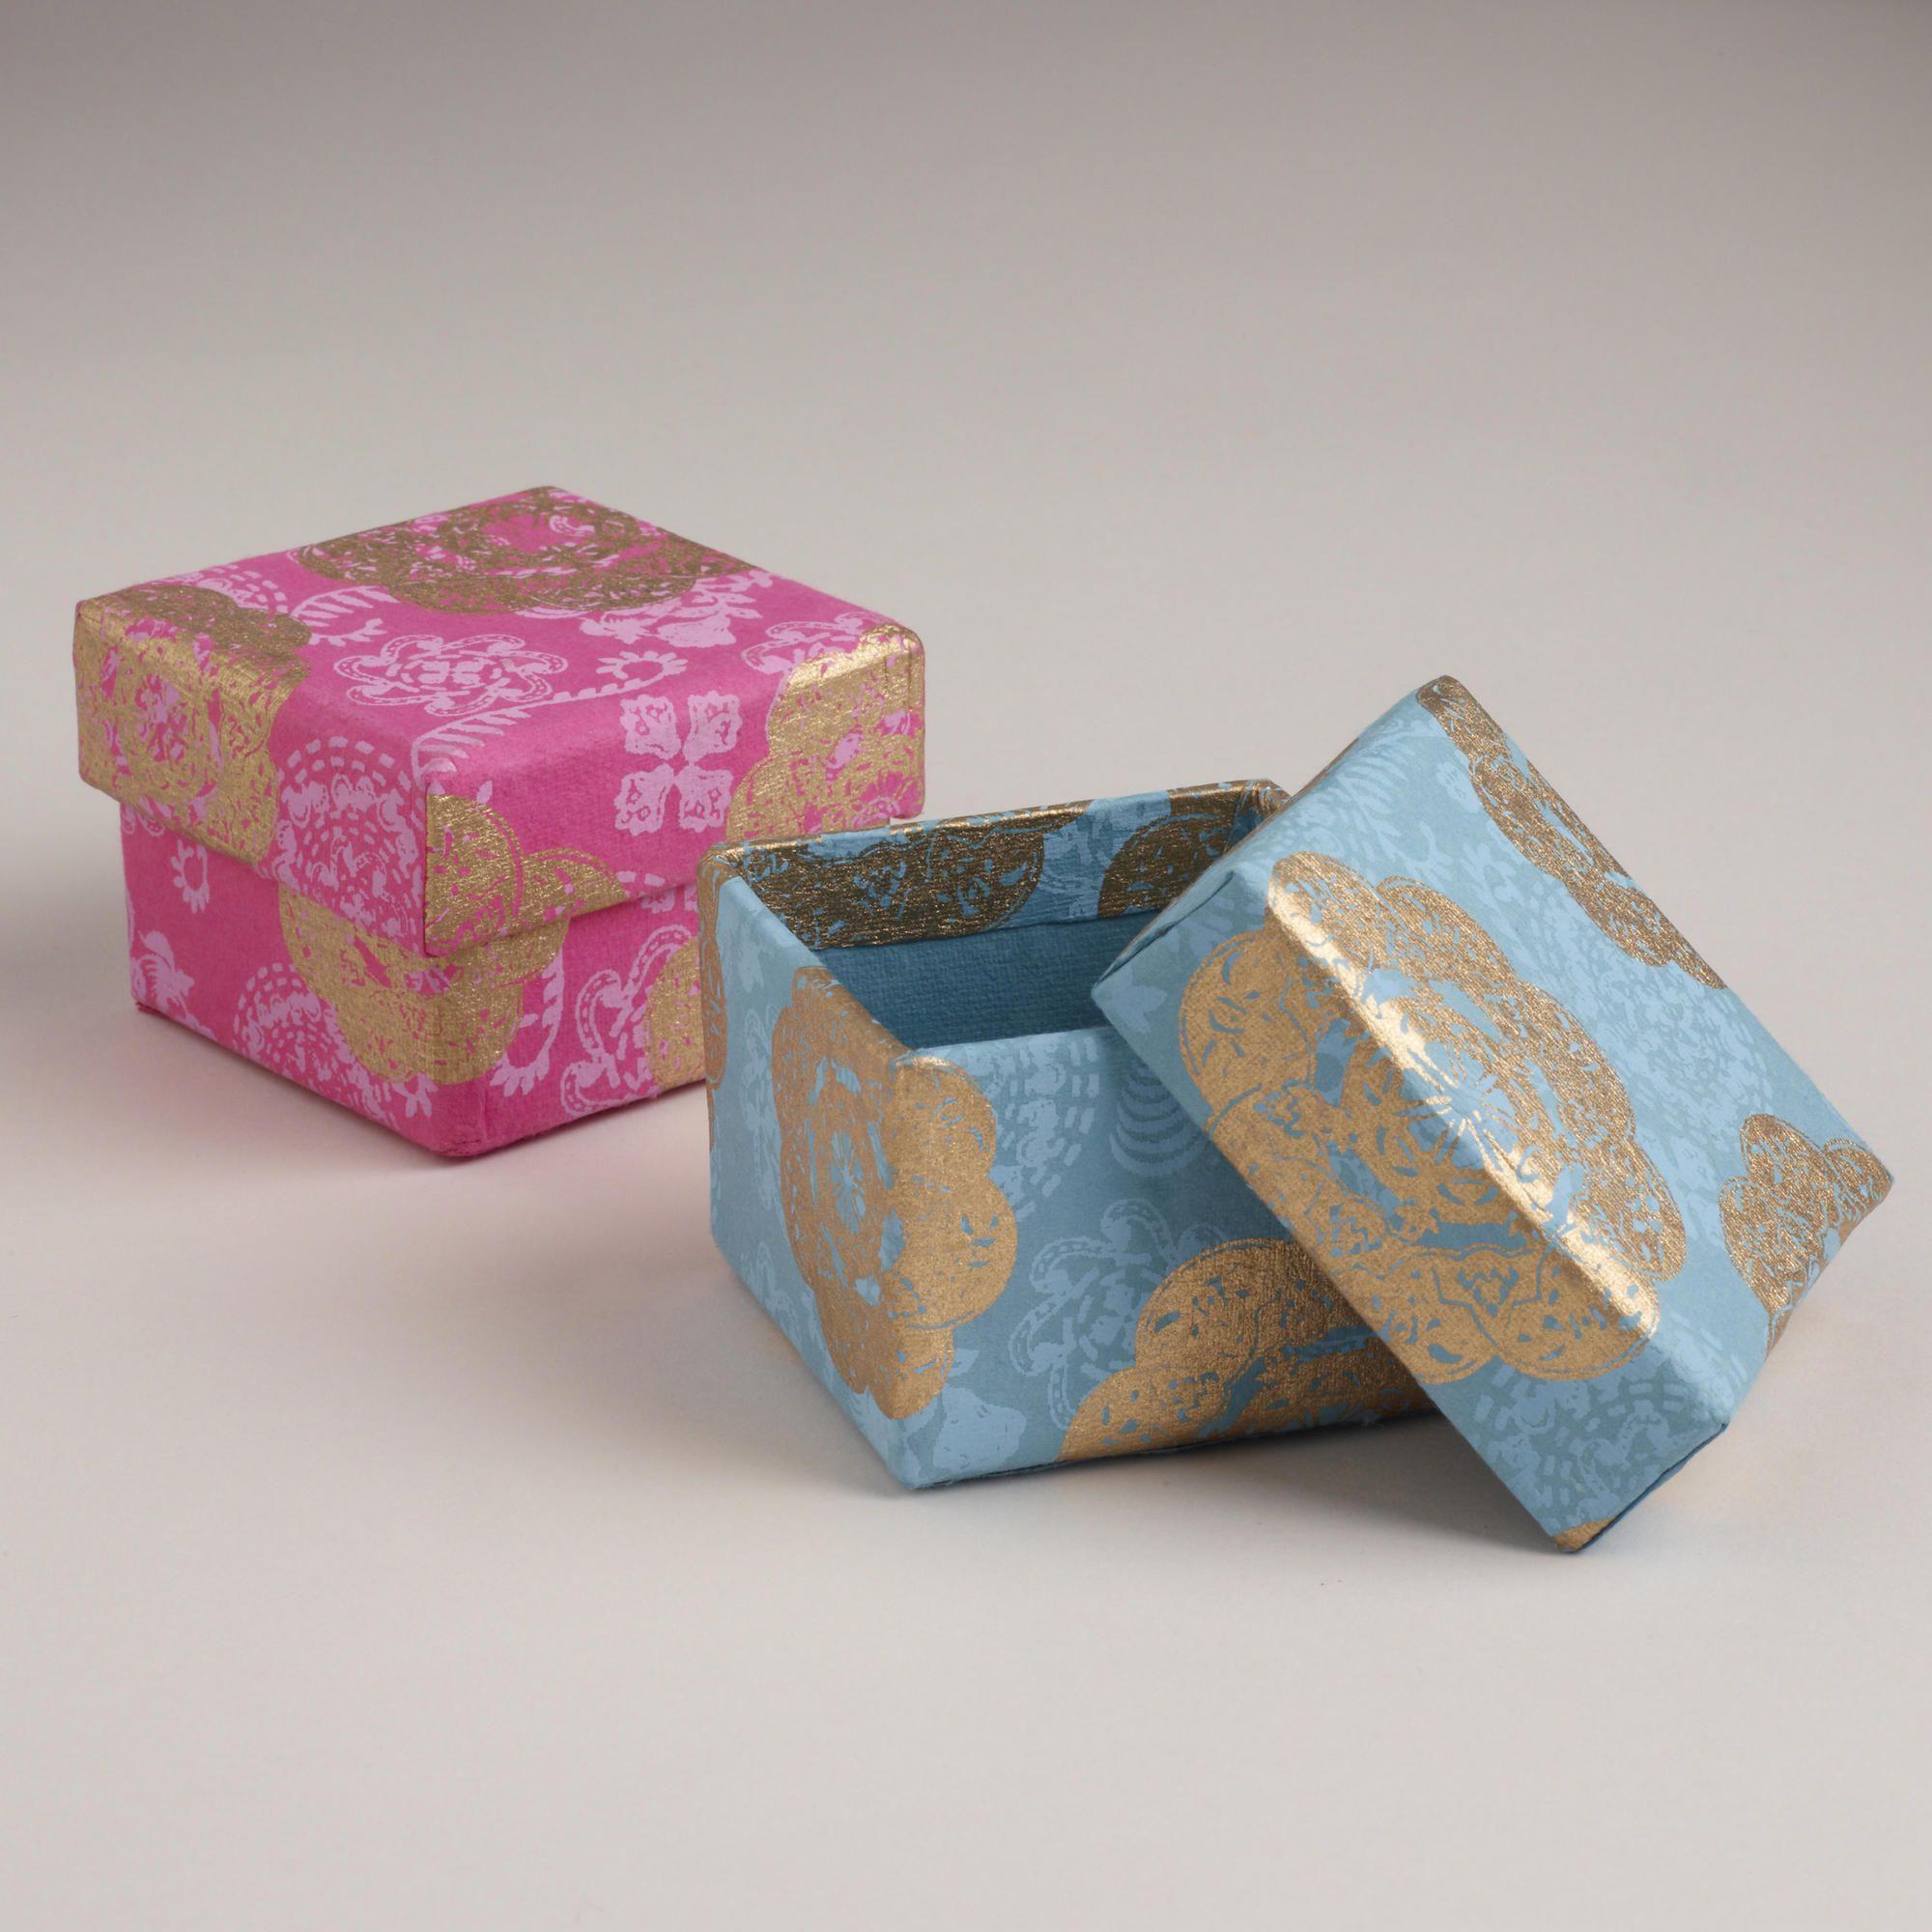 World Market Jewelry Box Small Jewelry Boxes  World Market  Birthdays And Unbirthdays